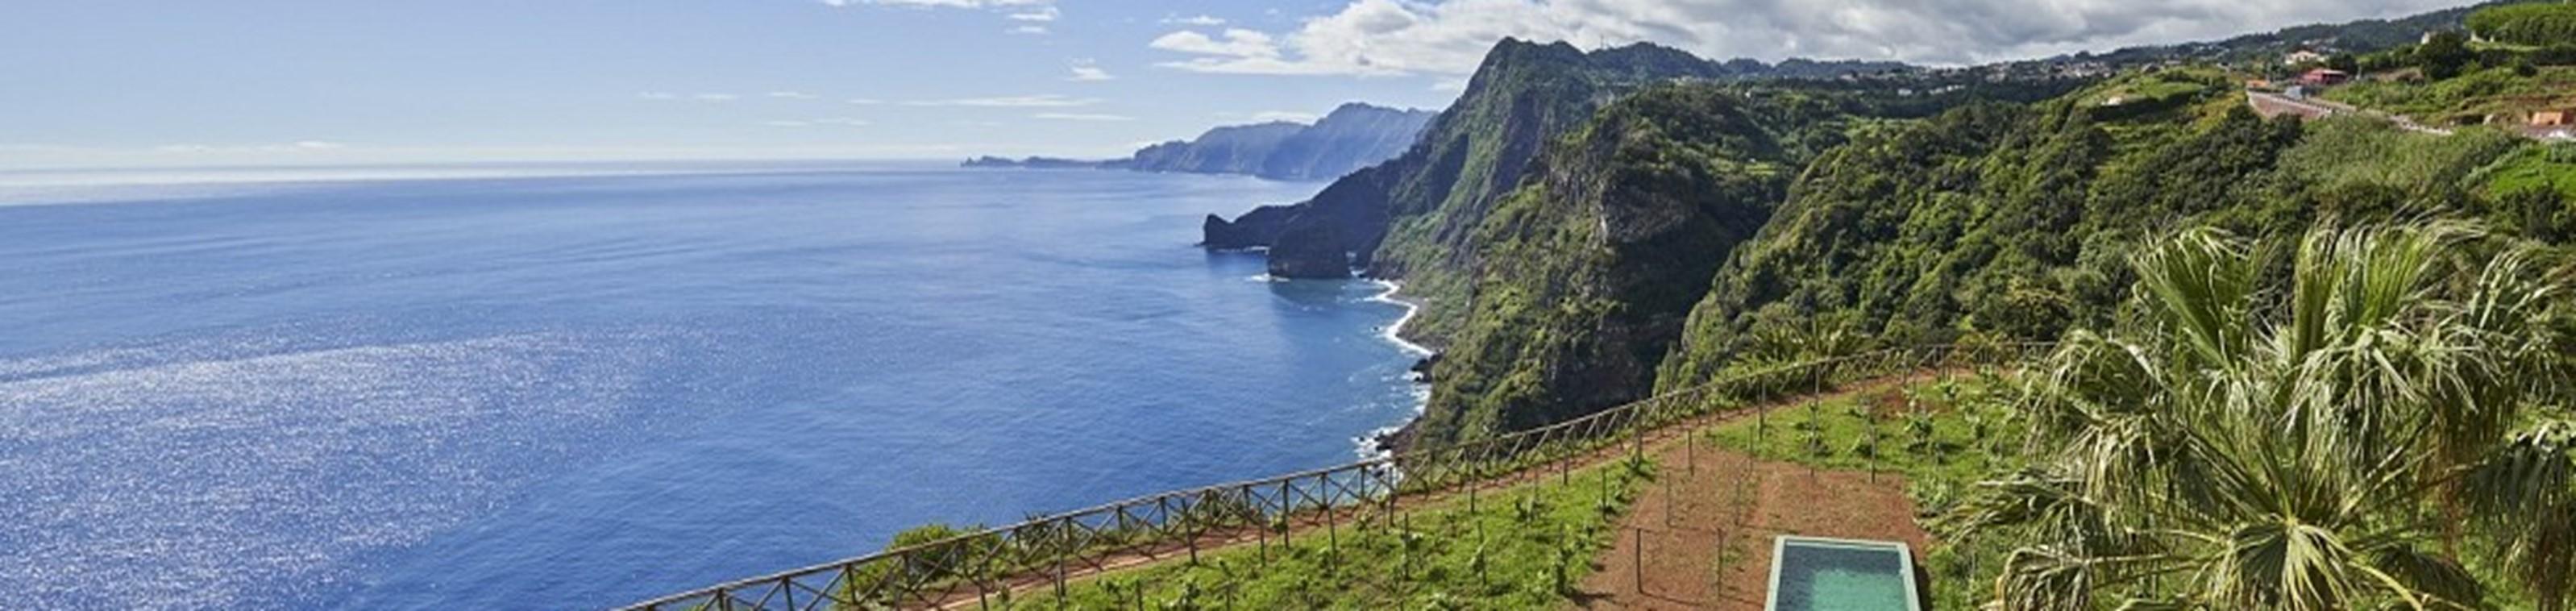 Madeira, fijnzinnigheid en natuurpracht